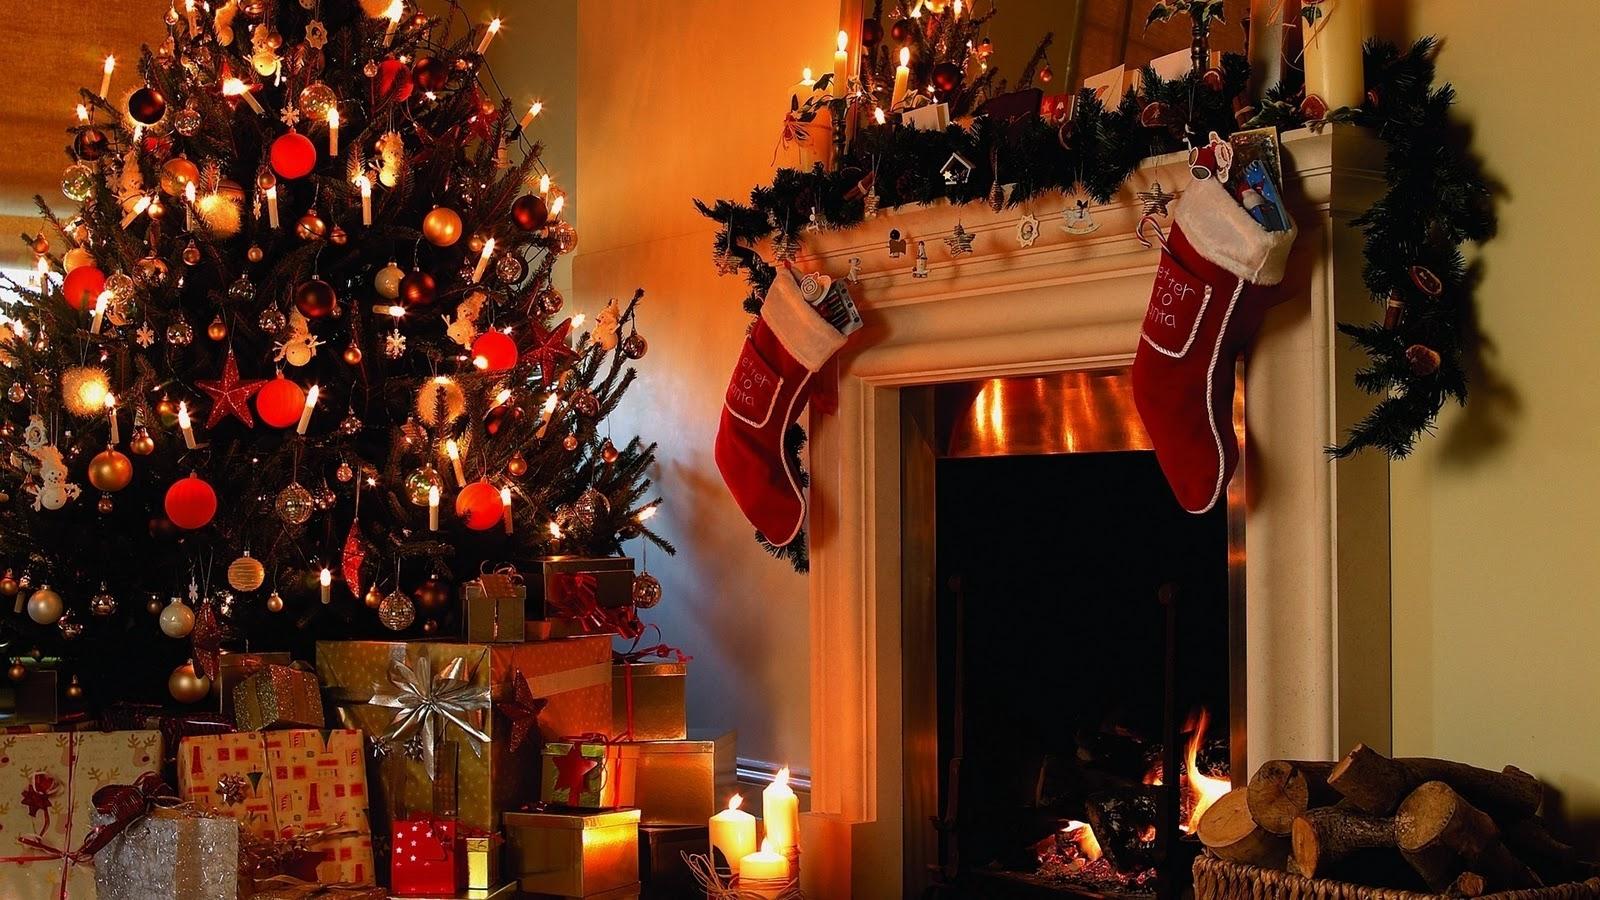 65] Christmas Fireplace Background on WallpaperSafari 1600x900